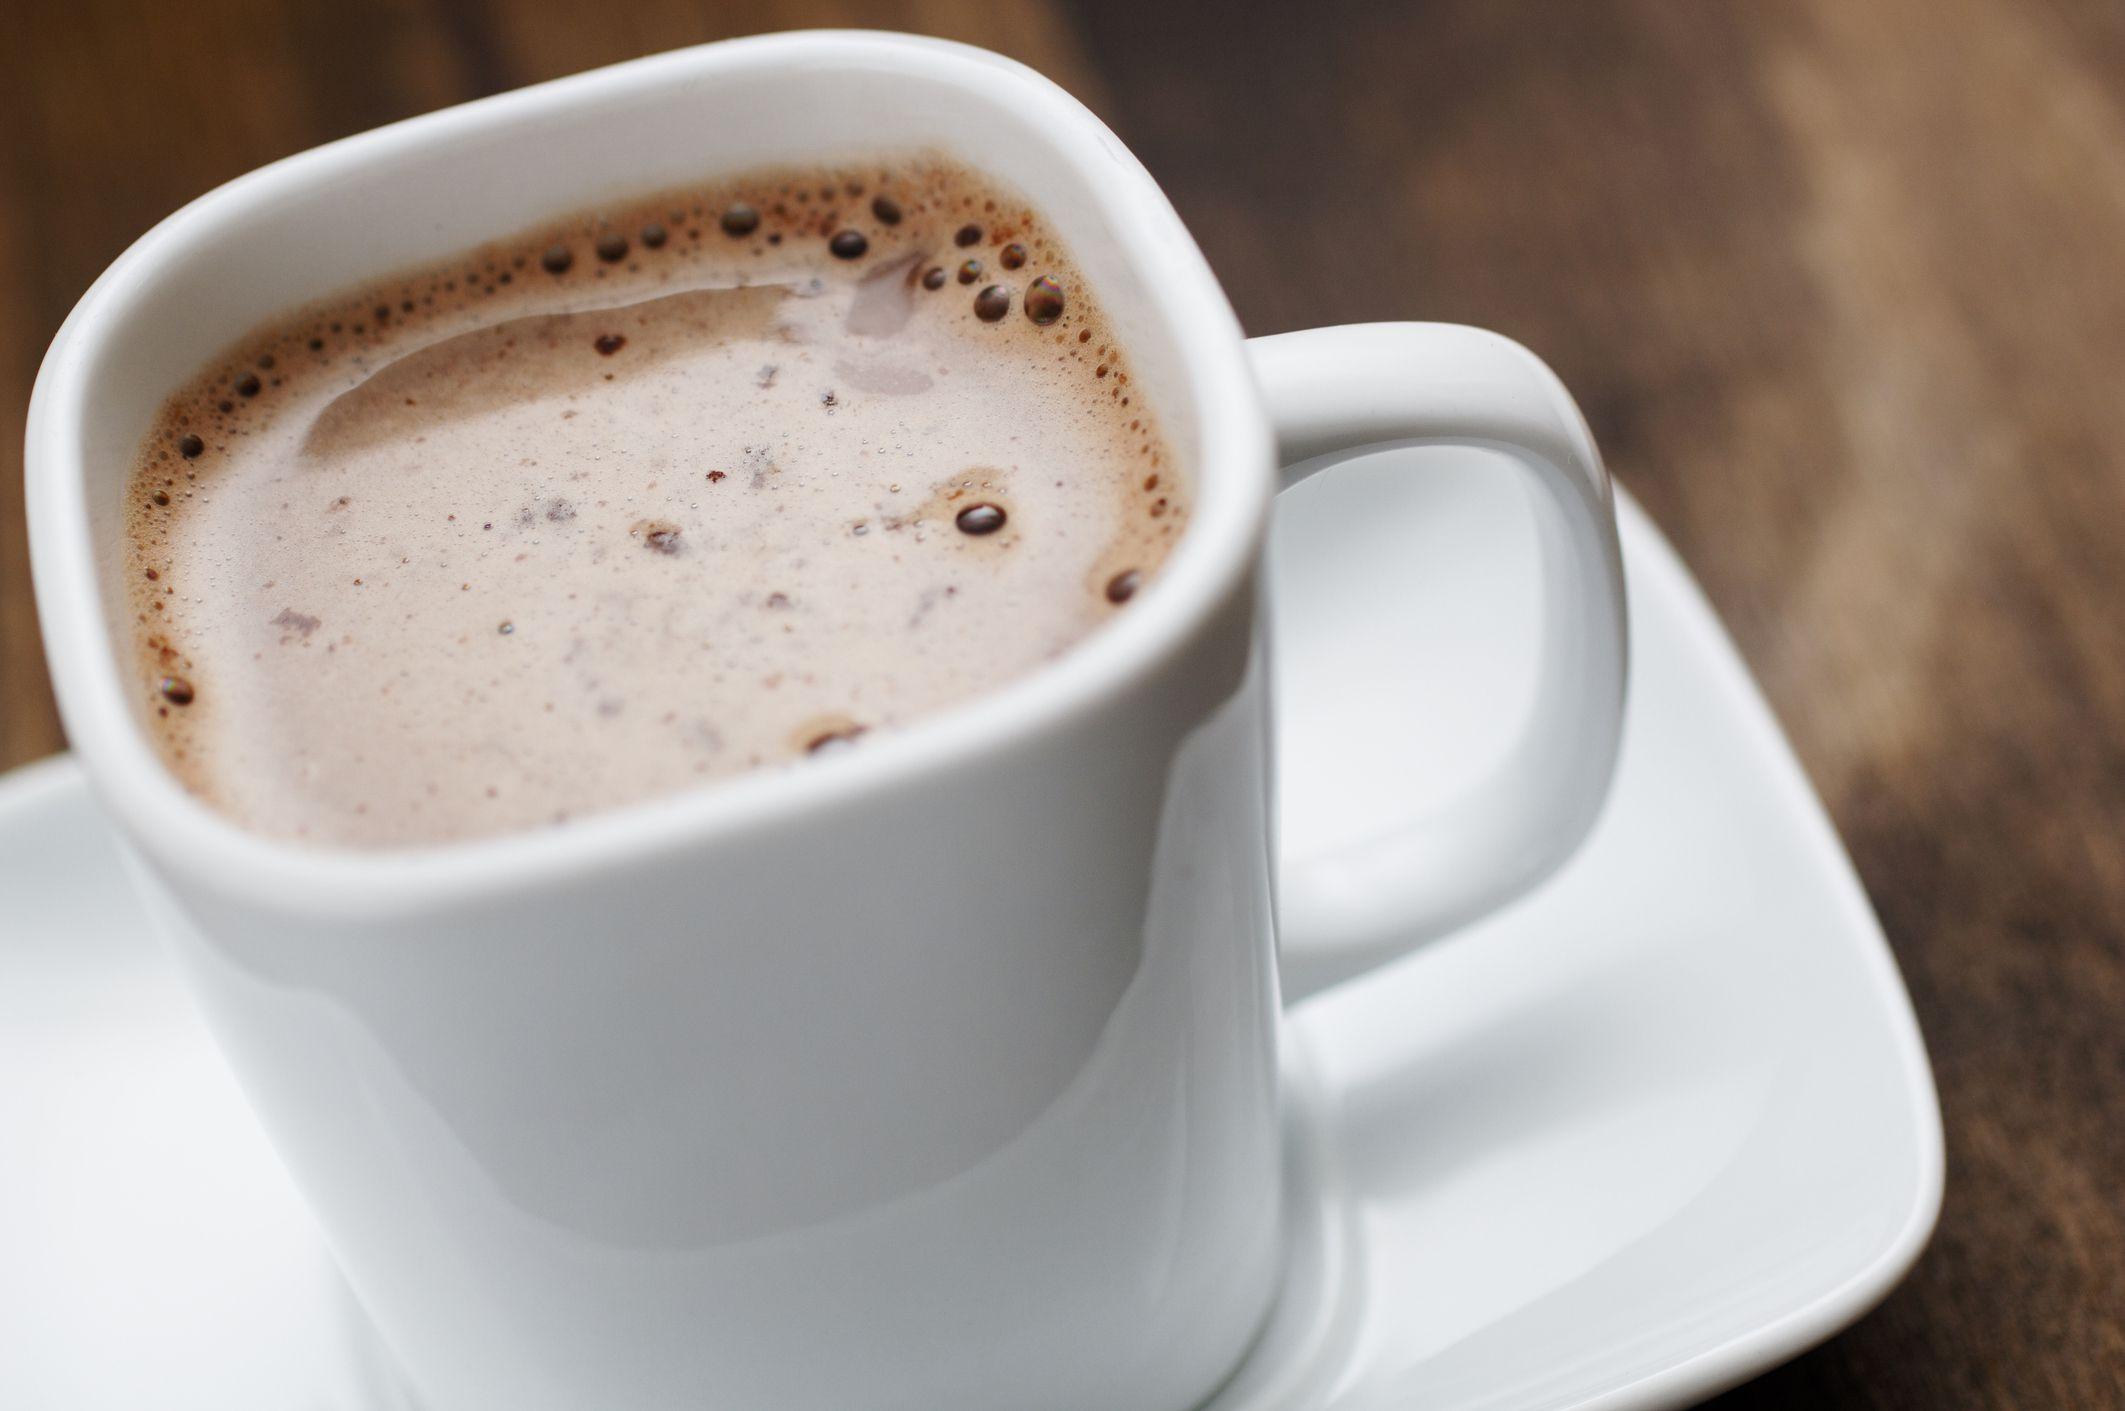 Hot-chocolate-581b9b4d5f9b581c0b1dcc12.j